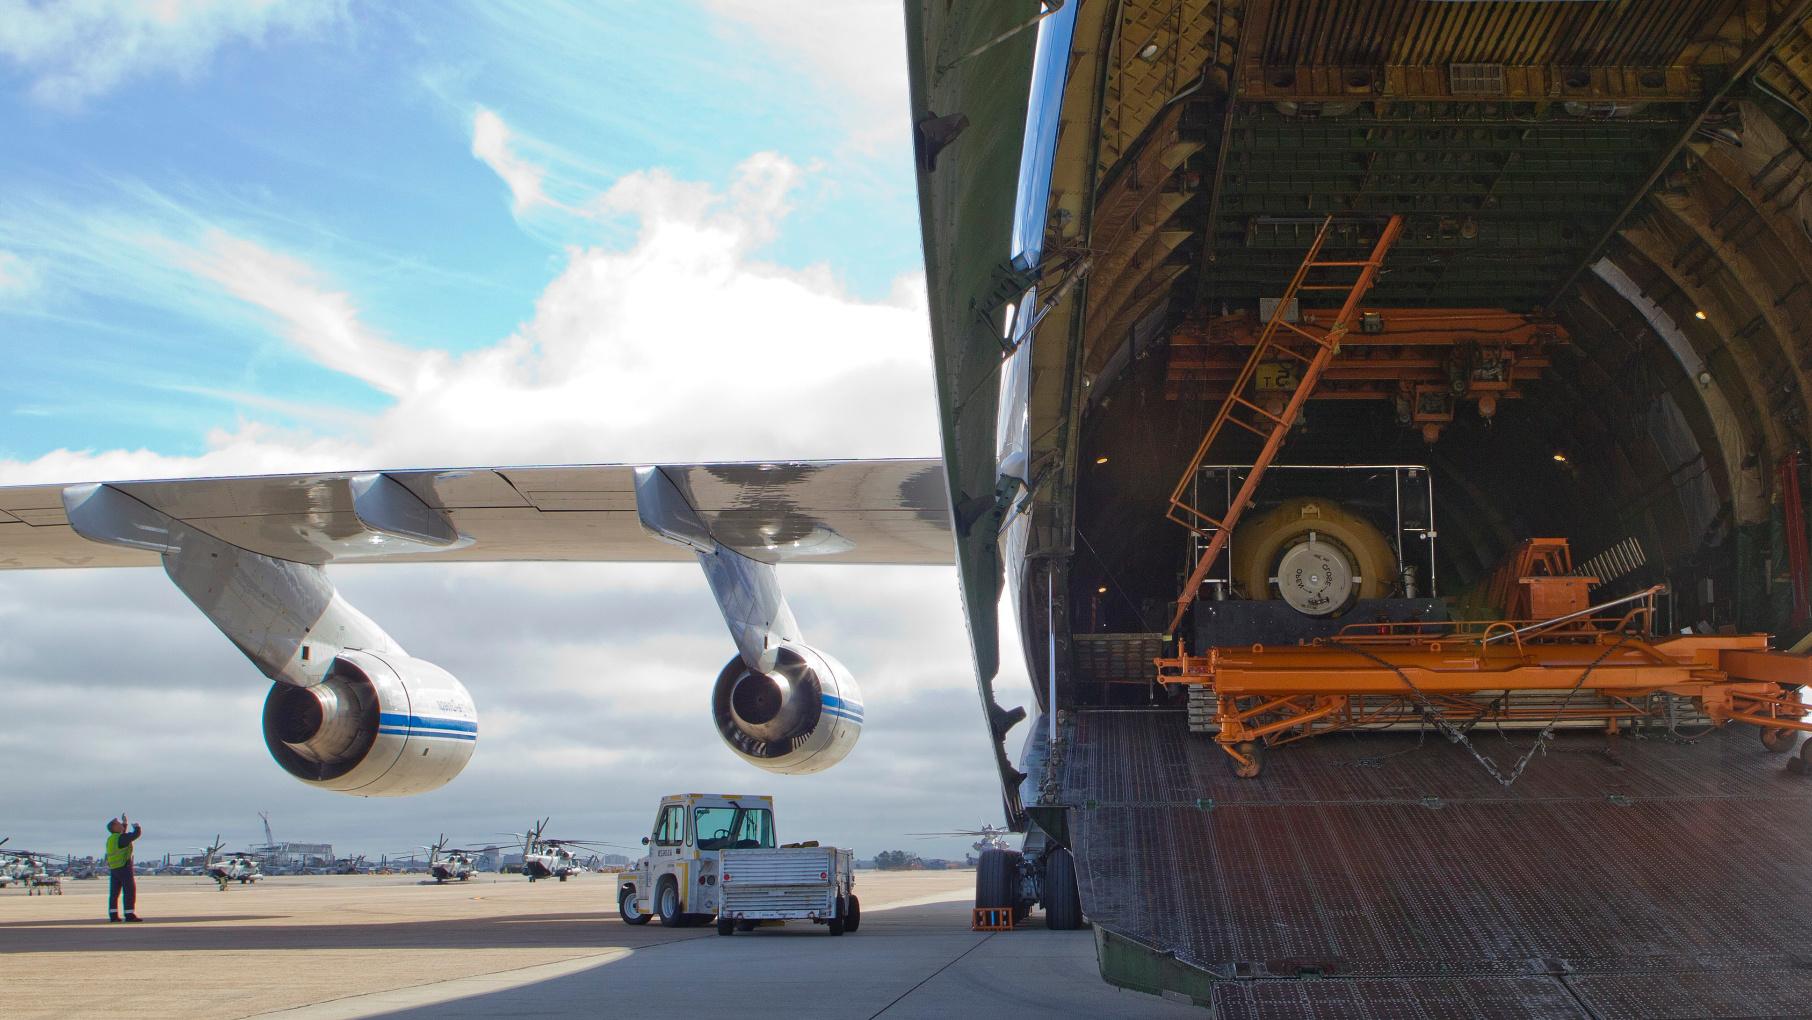 Russian_cargo_plane_visits_Miramar_121019-M-GC438-008 (2)